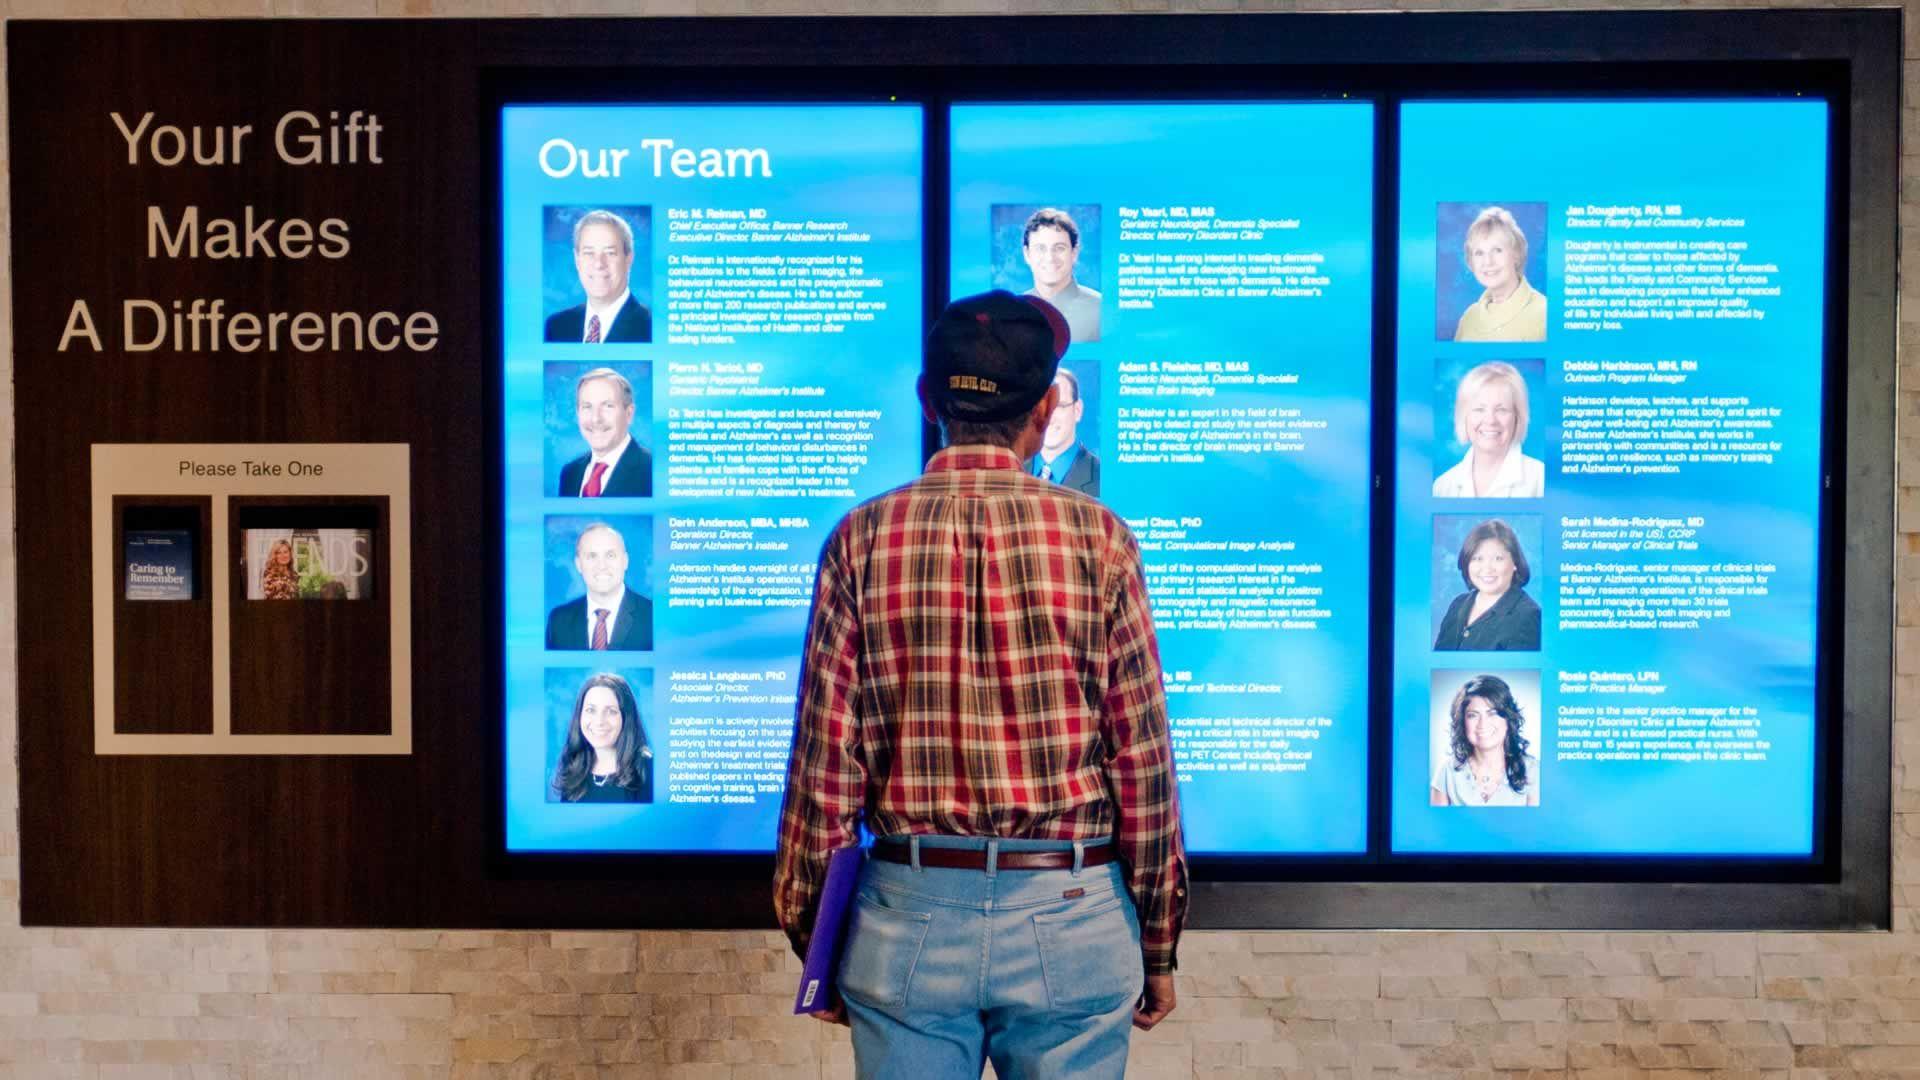 digital donor recognition, health care, digital signage